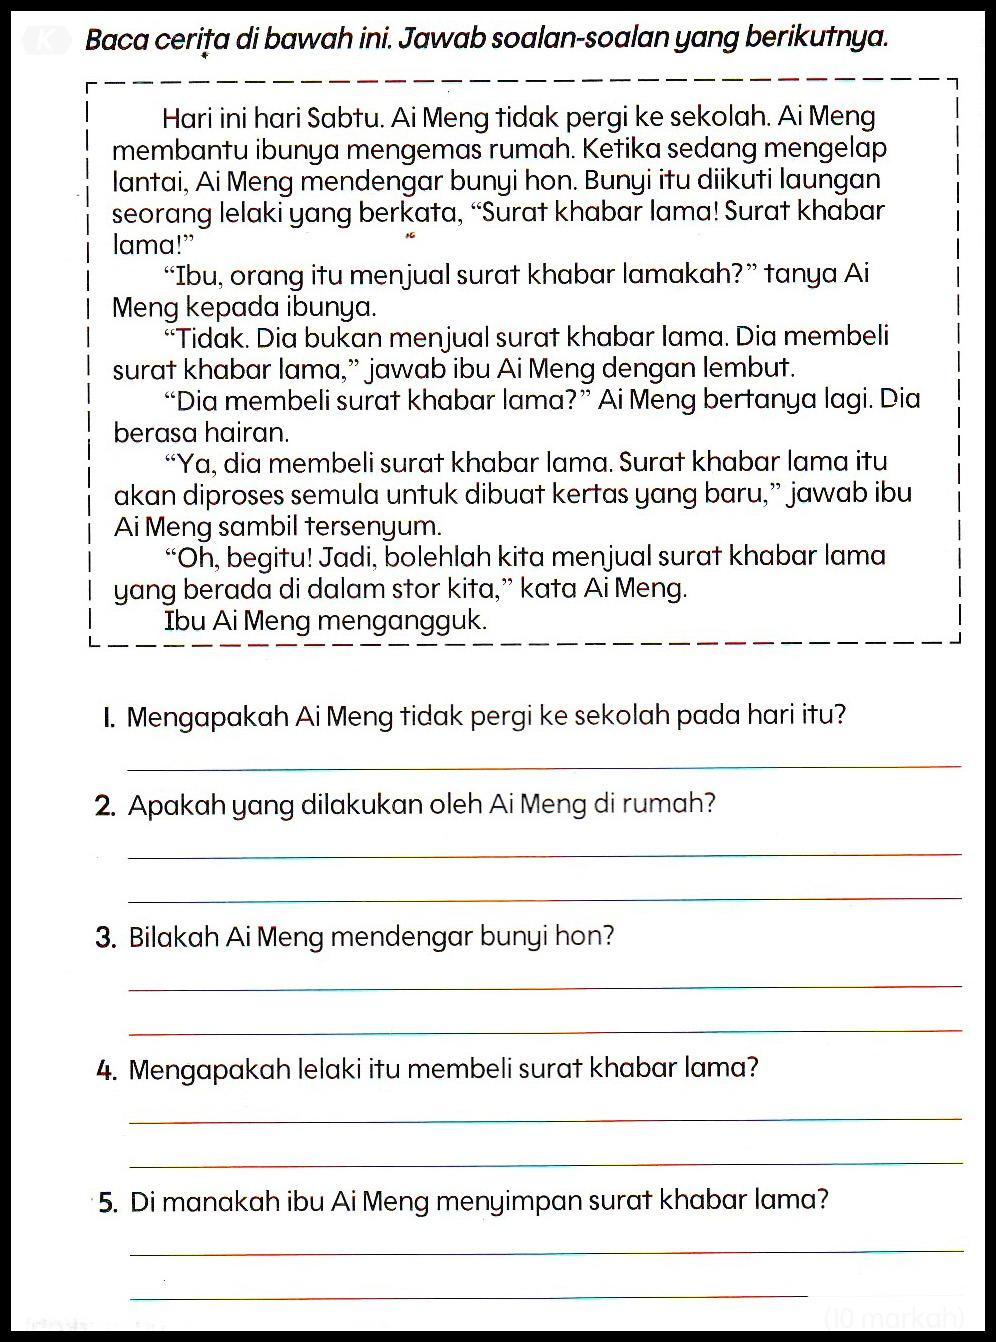 Soalan Latihan Bahasa Melayu Tahun 2 Kecemasan E